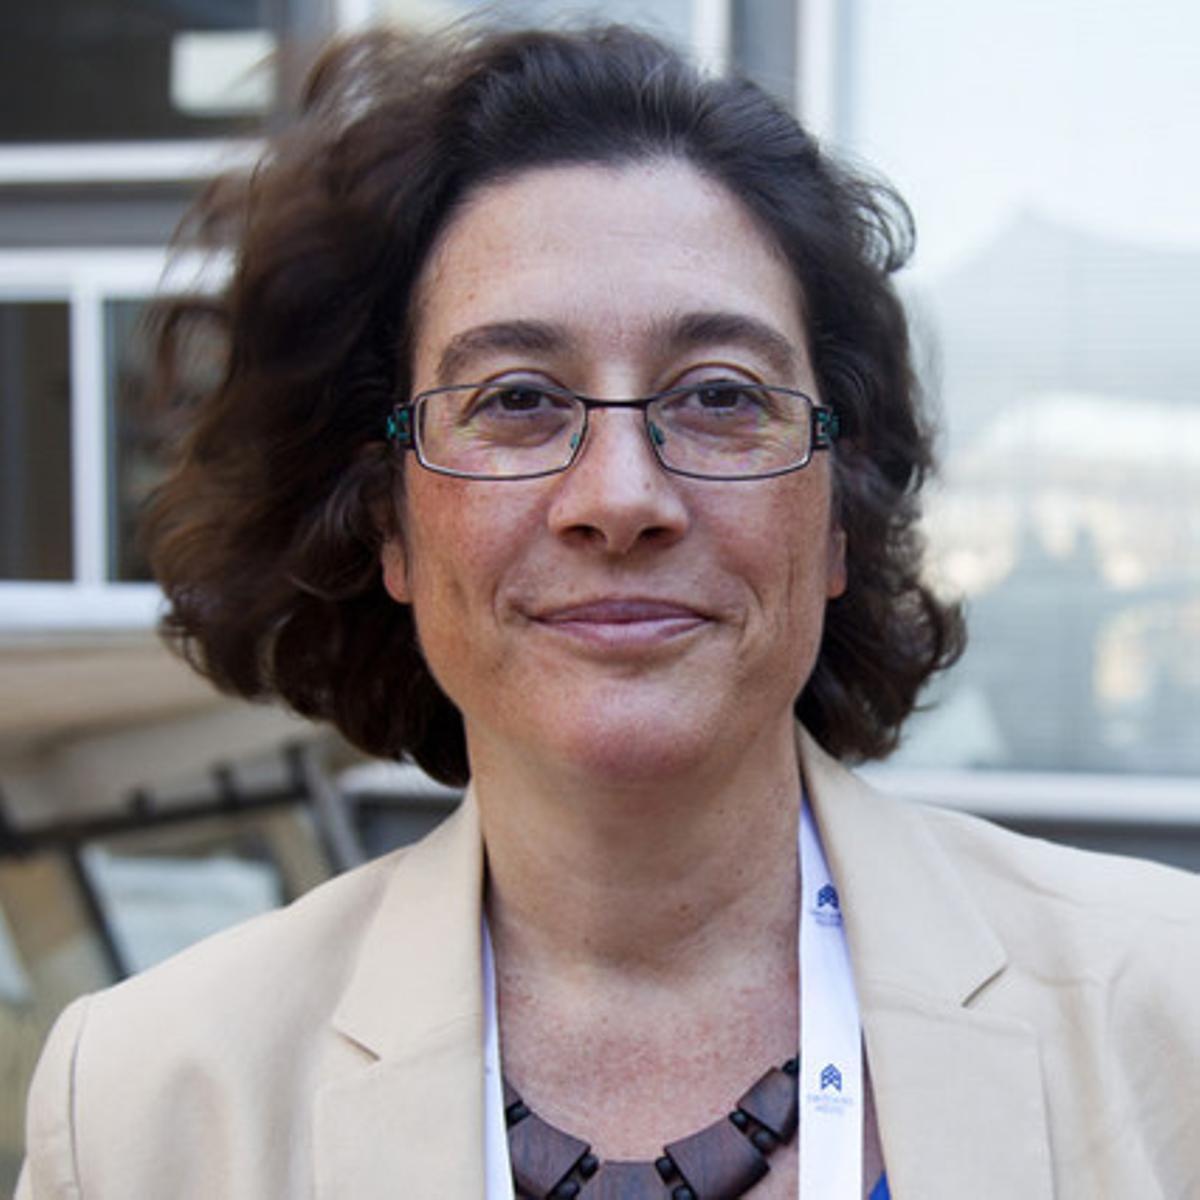 Sonia Jorge, directora ejecutiva de A4AI (The Alliance for Affordable Internet)